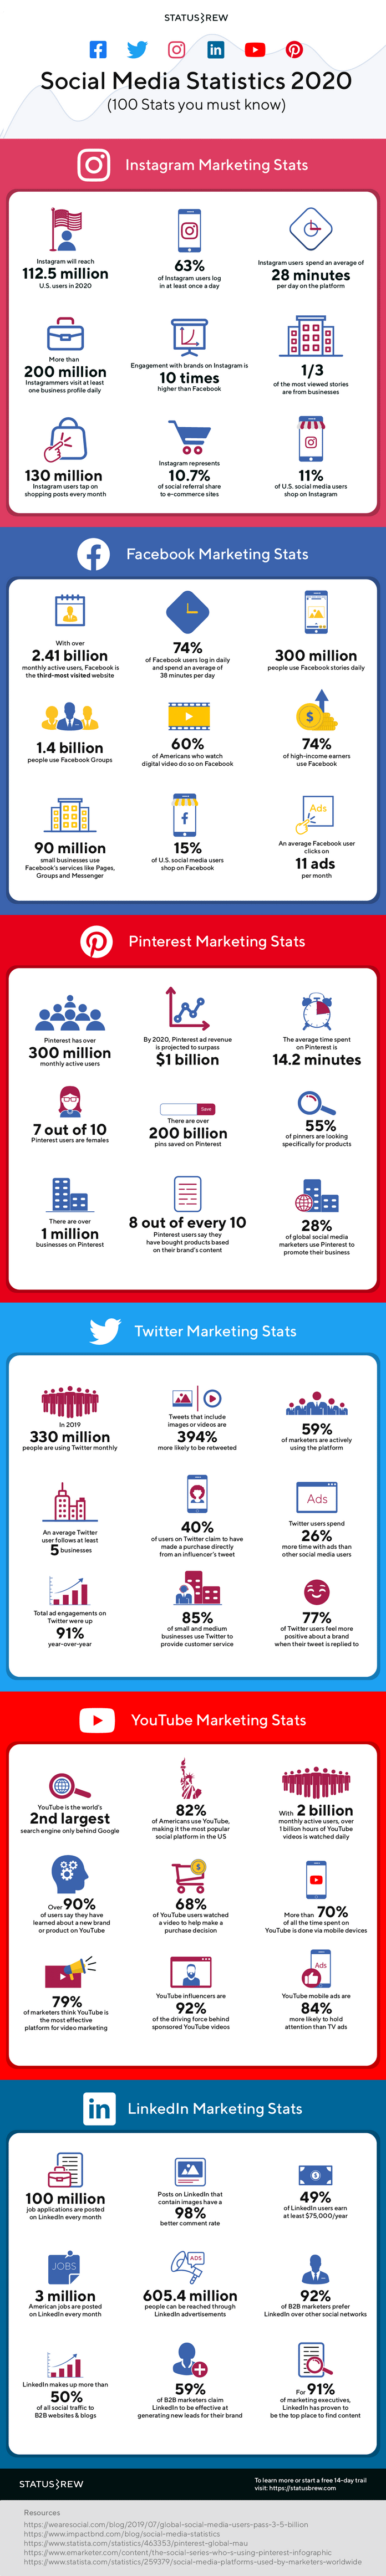 instagram demographics 13 impressive statistics about instagram users 100 Social Media Statistics For 2020 Infographic Statusbrew